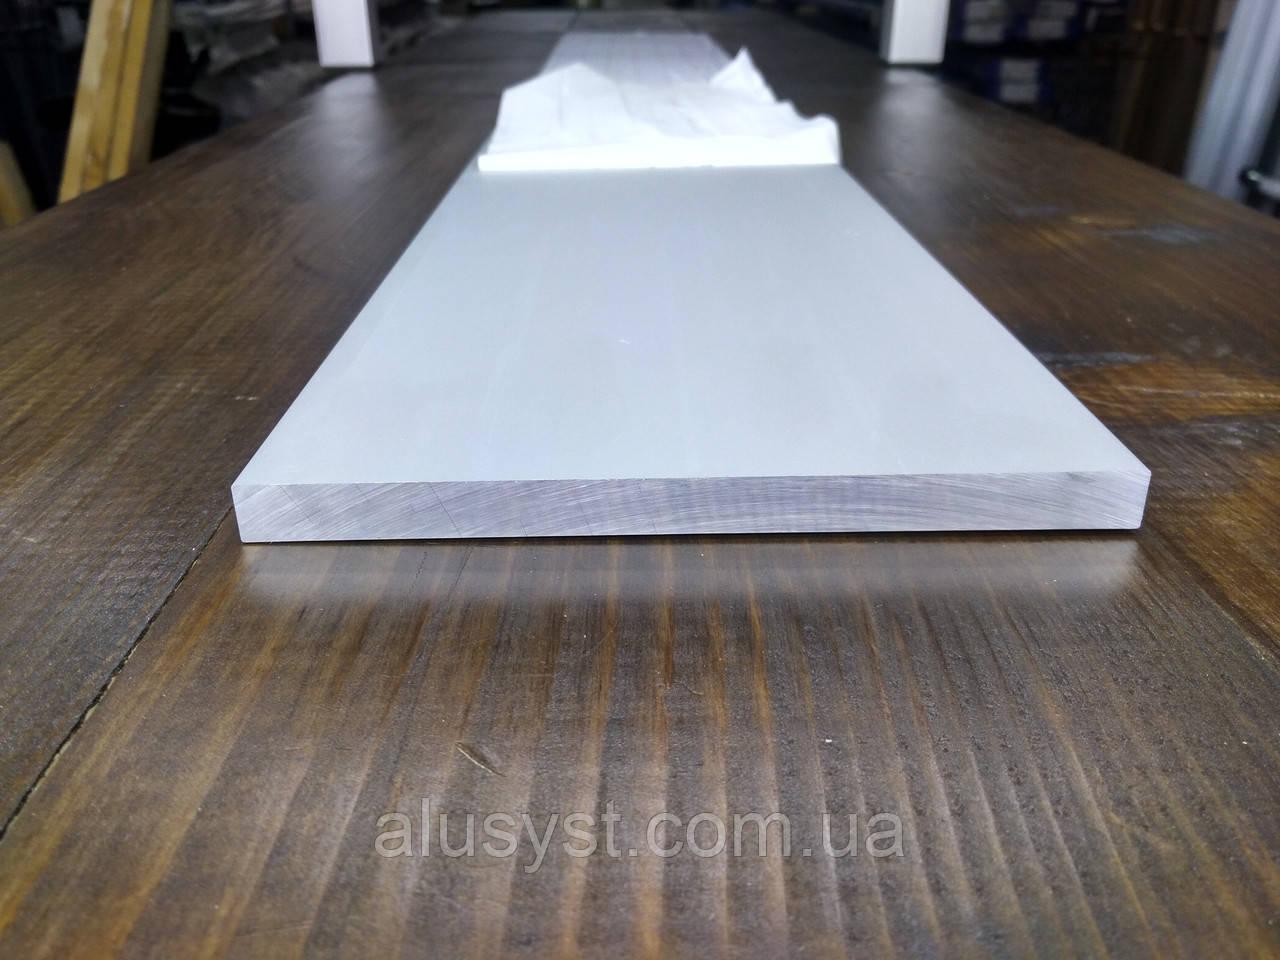 Алюминиевая полоса 140х10, анод 1 метр   Шина